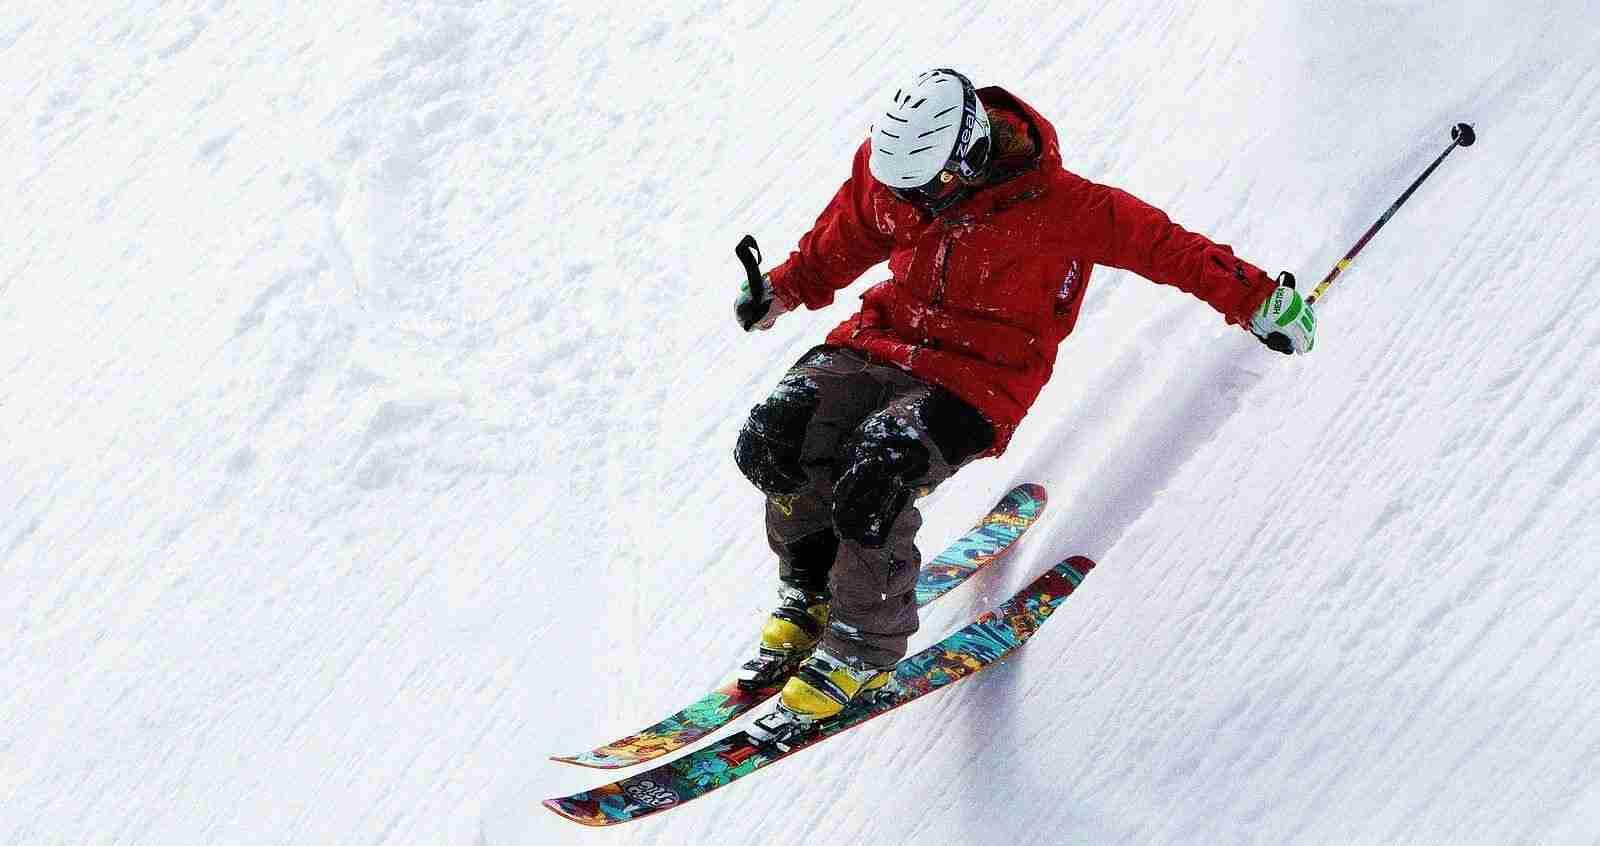 WastedLocker Ransomware Hits Boyne Resorts Ski Resort Operator